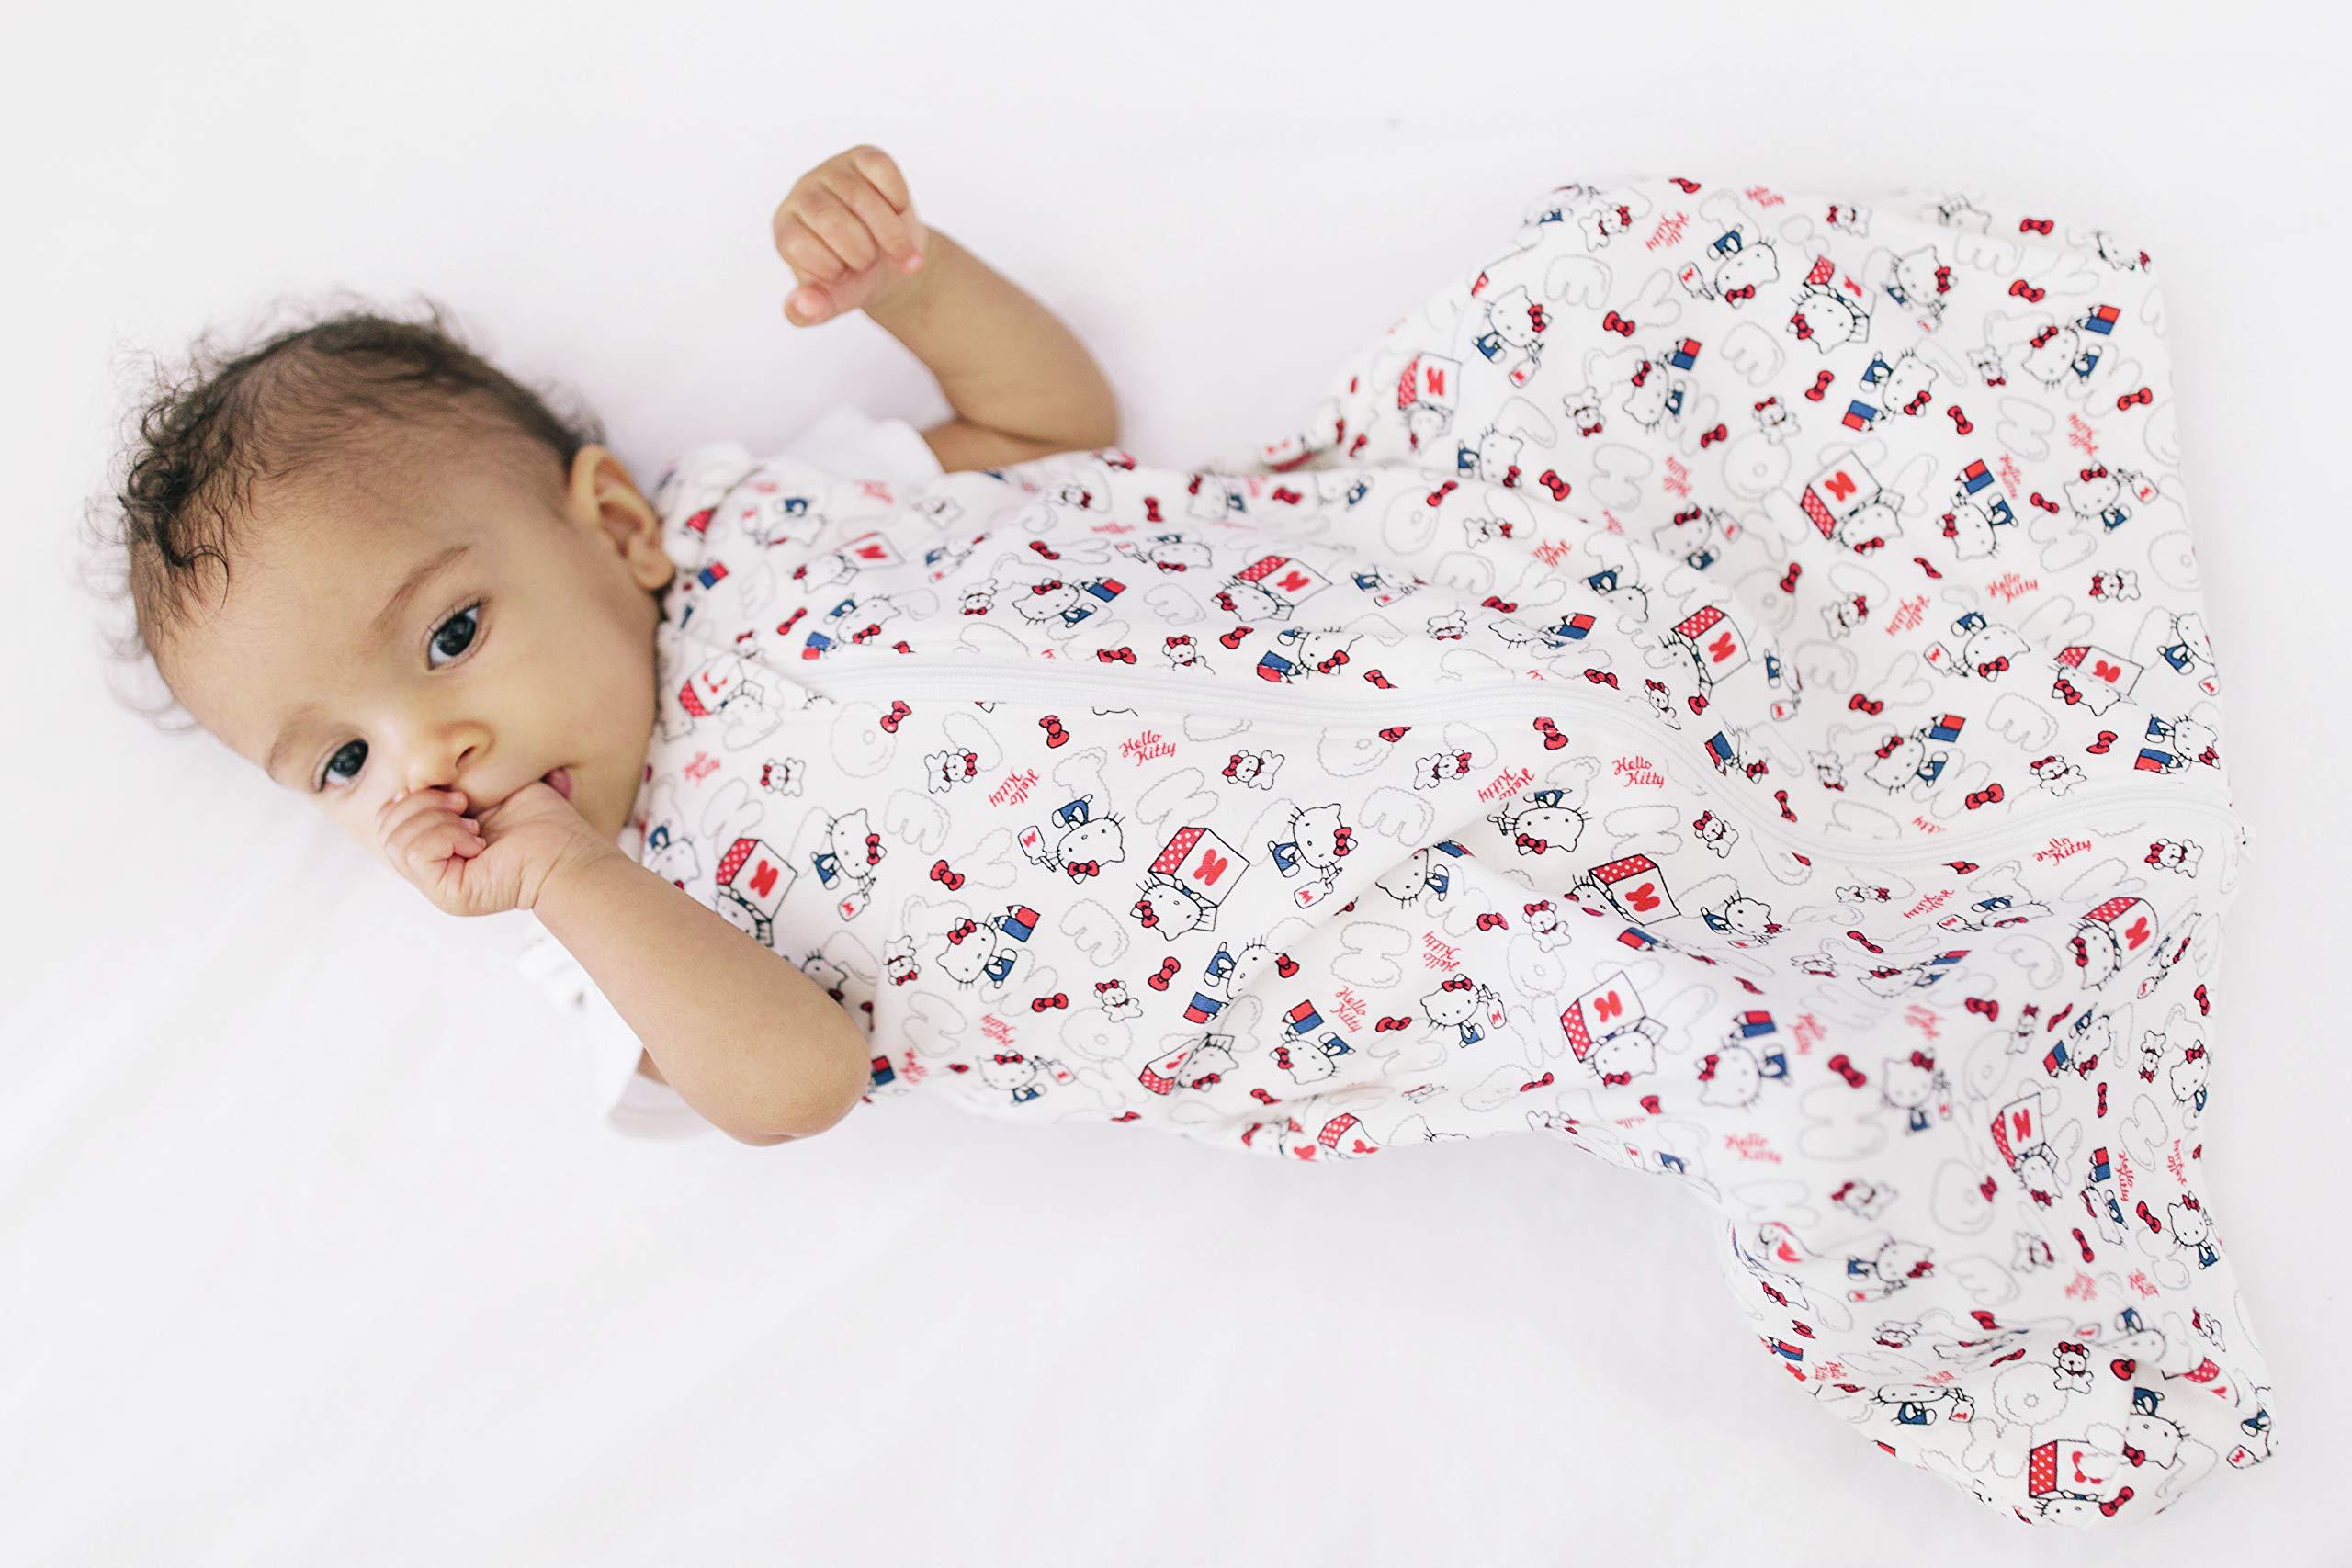 Ergobaby Saco de Dormir Bebe Recién Nacidos en Algodón Hello Kitty Head In The Clouds, Niño Niña 0-6meses, TOG0.5